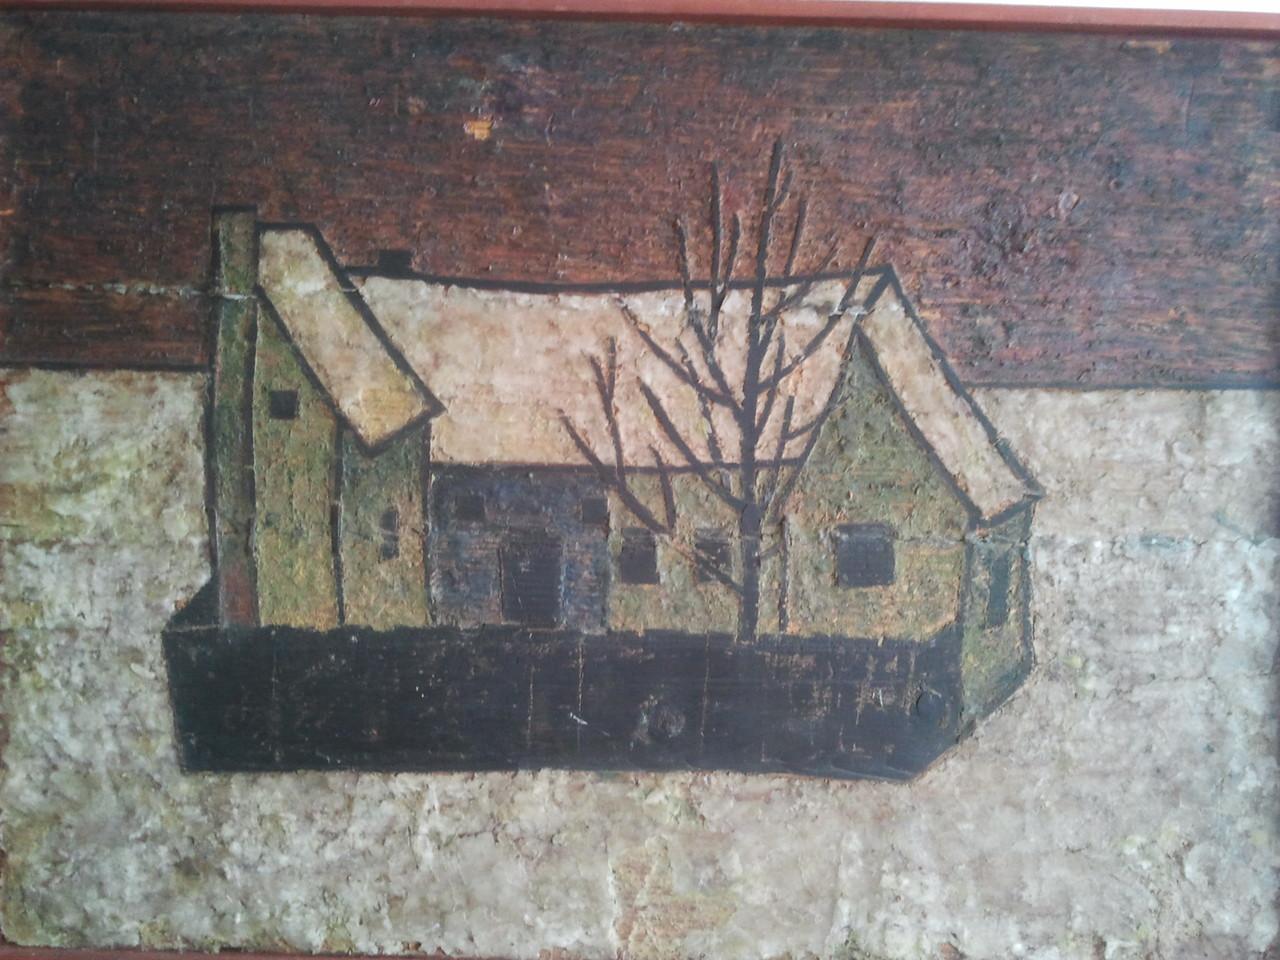 Vision II, Seestadt-Apern 1950, 1.Haus IQ 2012, Wachsenkaustik